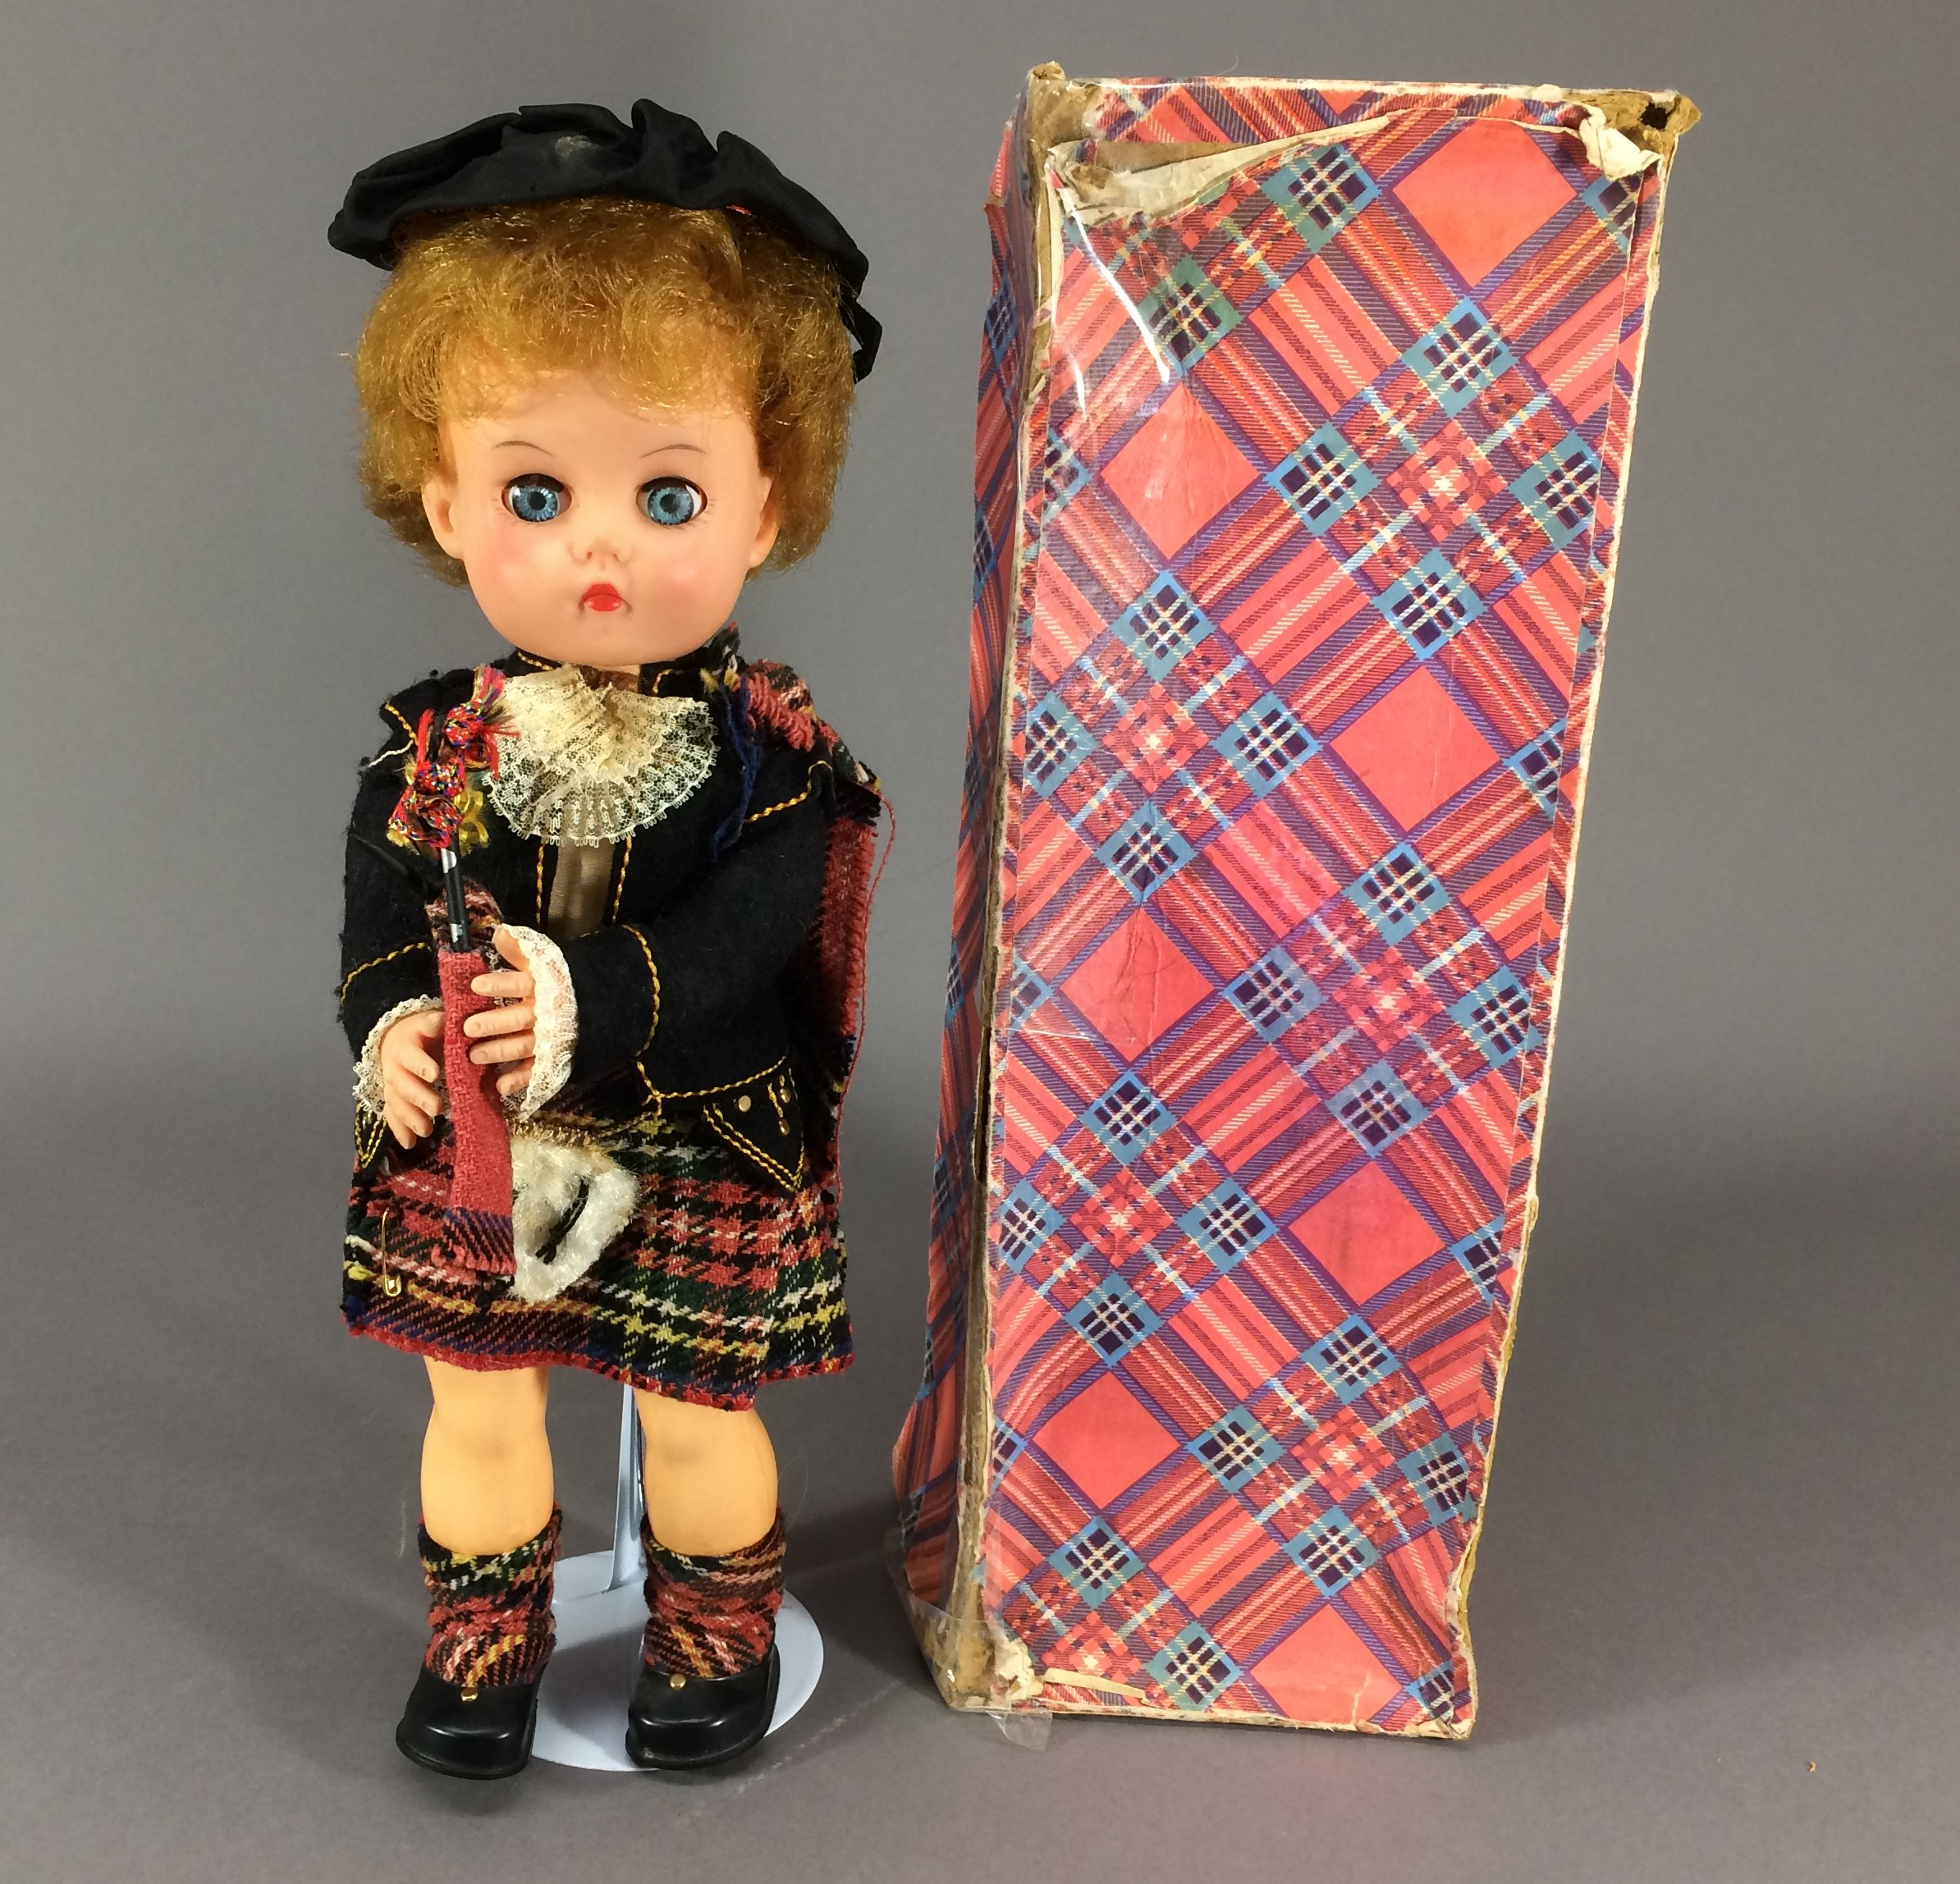 Pedigree Highland Lassie doll